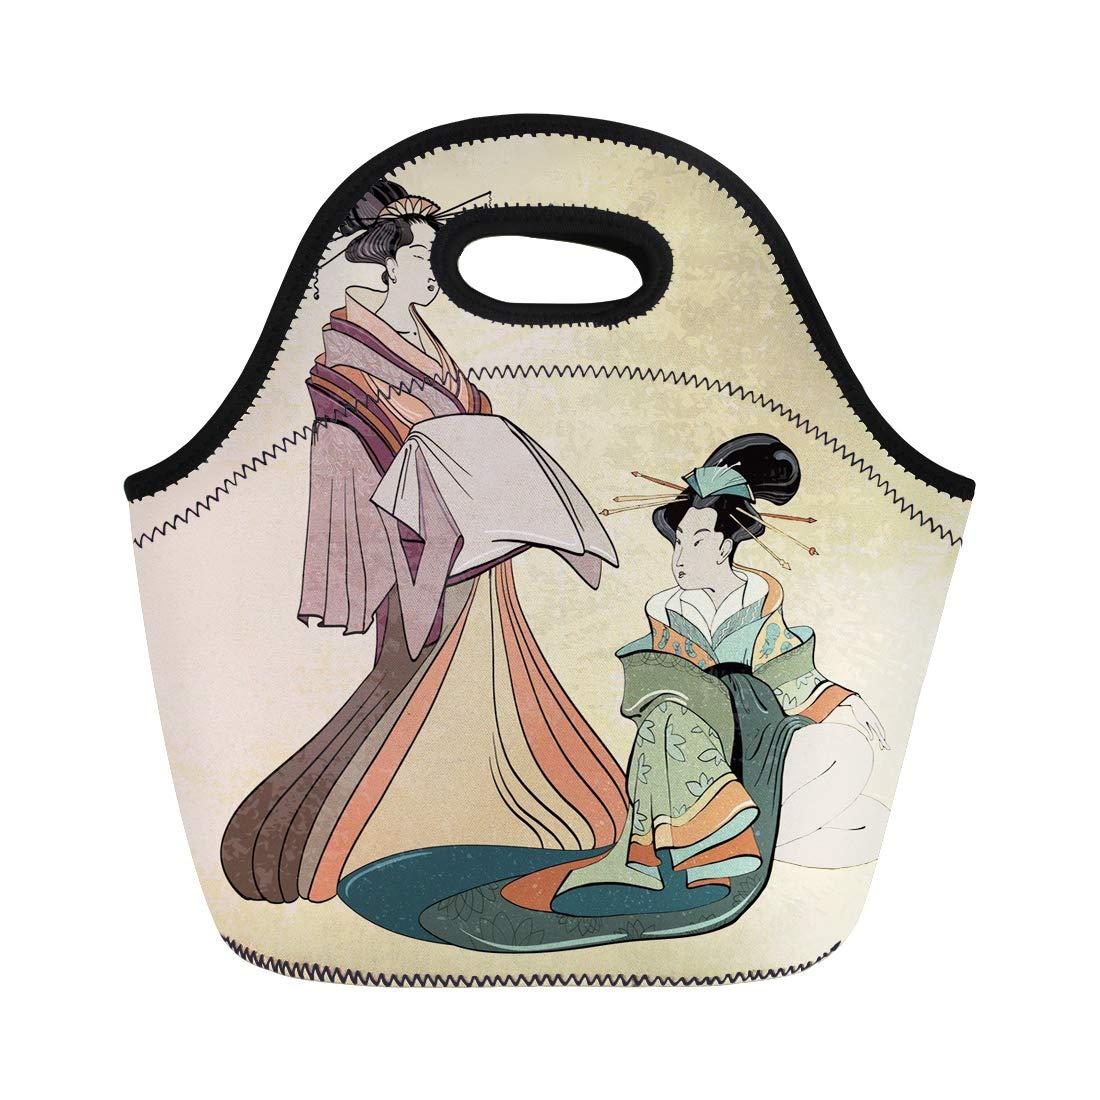 1100x1100 Semtomn Lunch Tote Bag Geisha Ancient Japan Classical